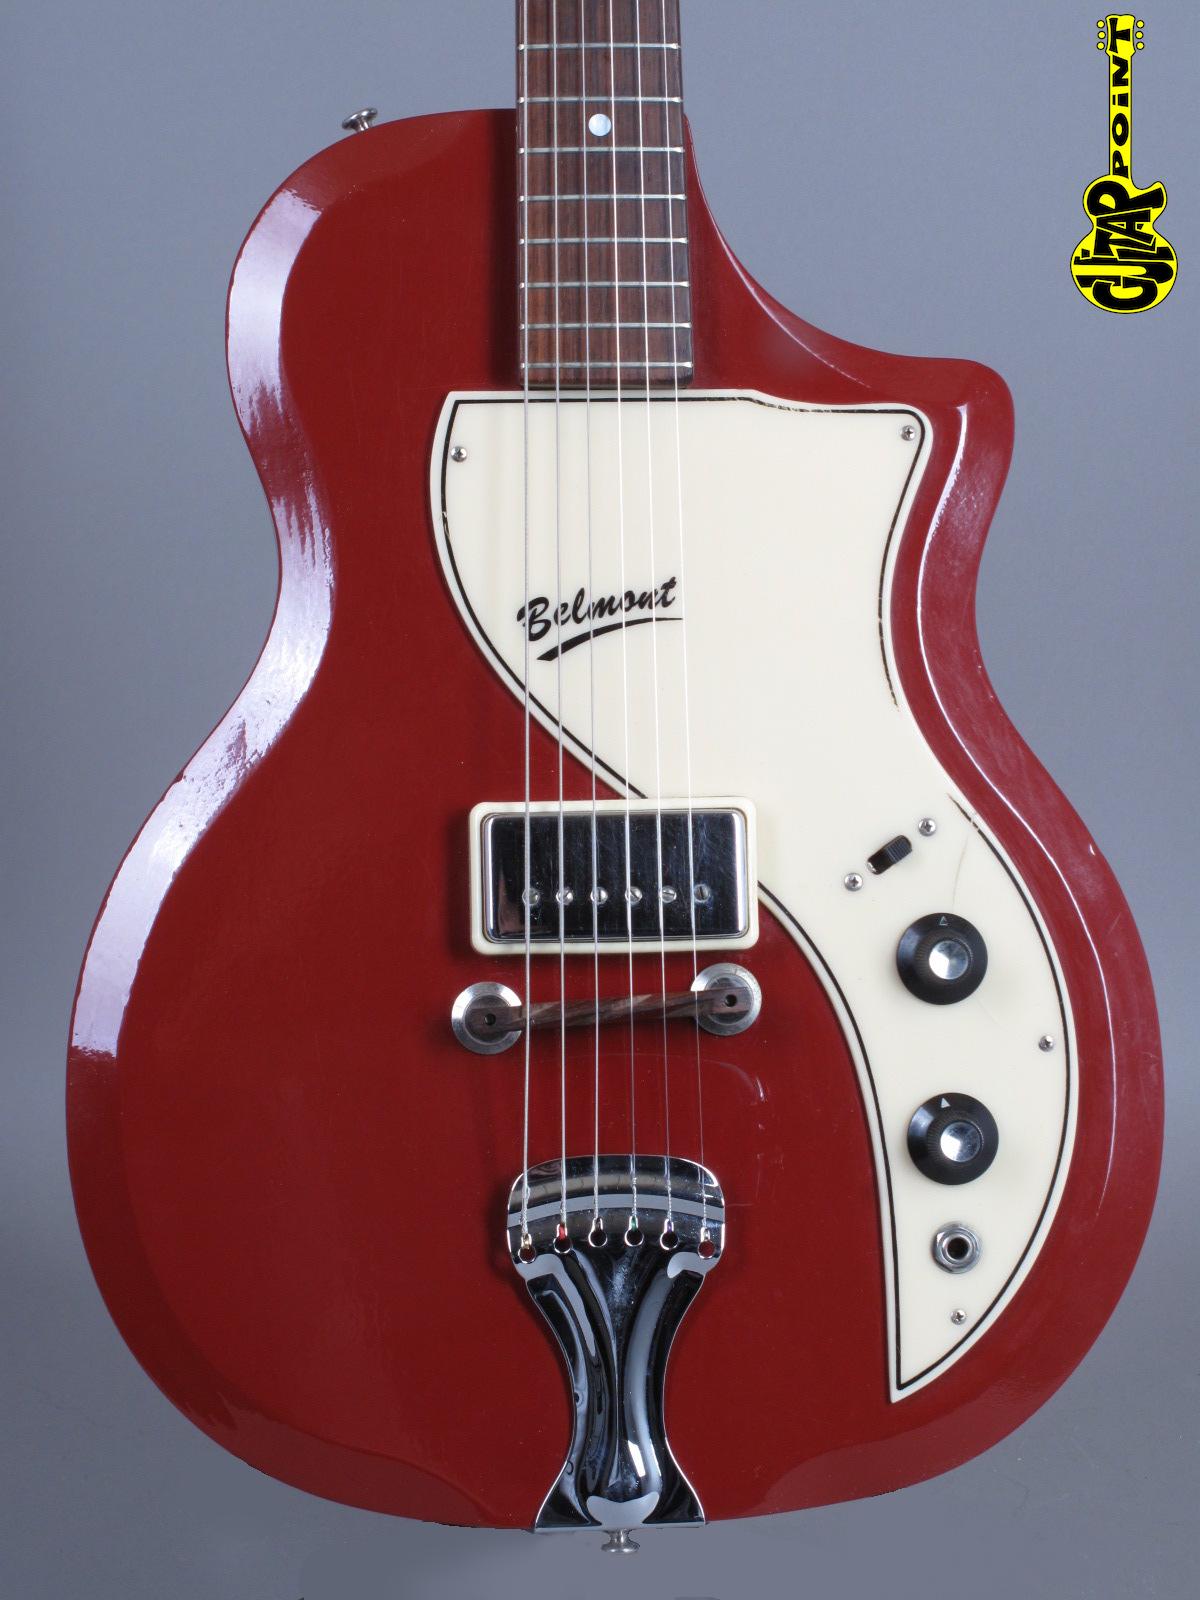 1961 Supro 1570 Belmont - Maroon